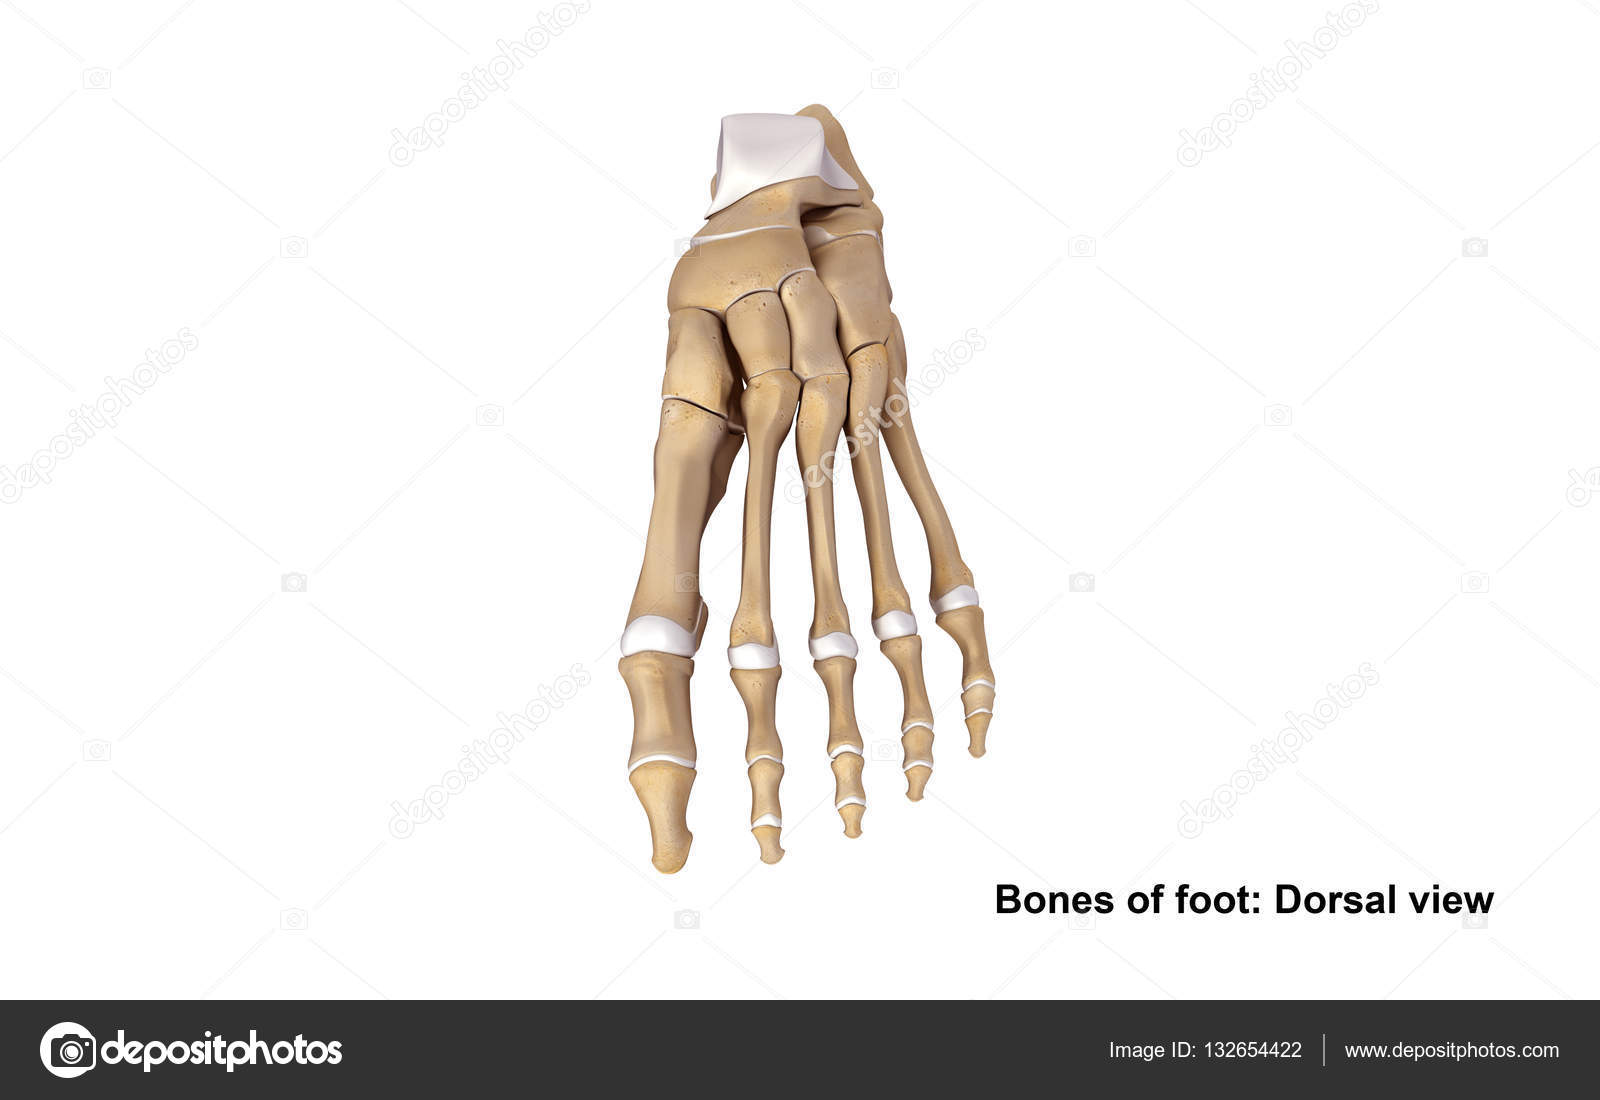 Skelett Fuß Pflanzer-Ansicht — Stockfoto © sciencepics #132654422